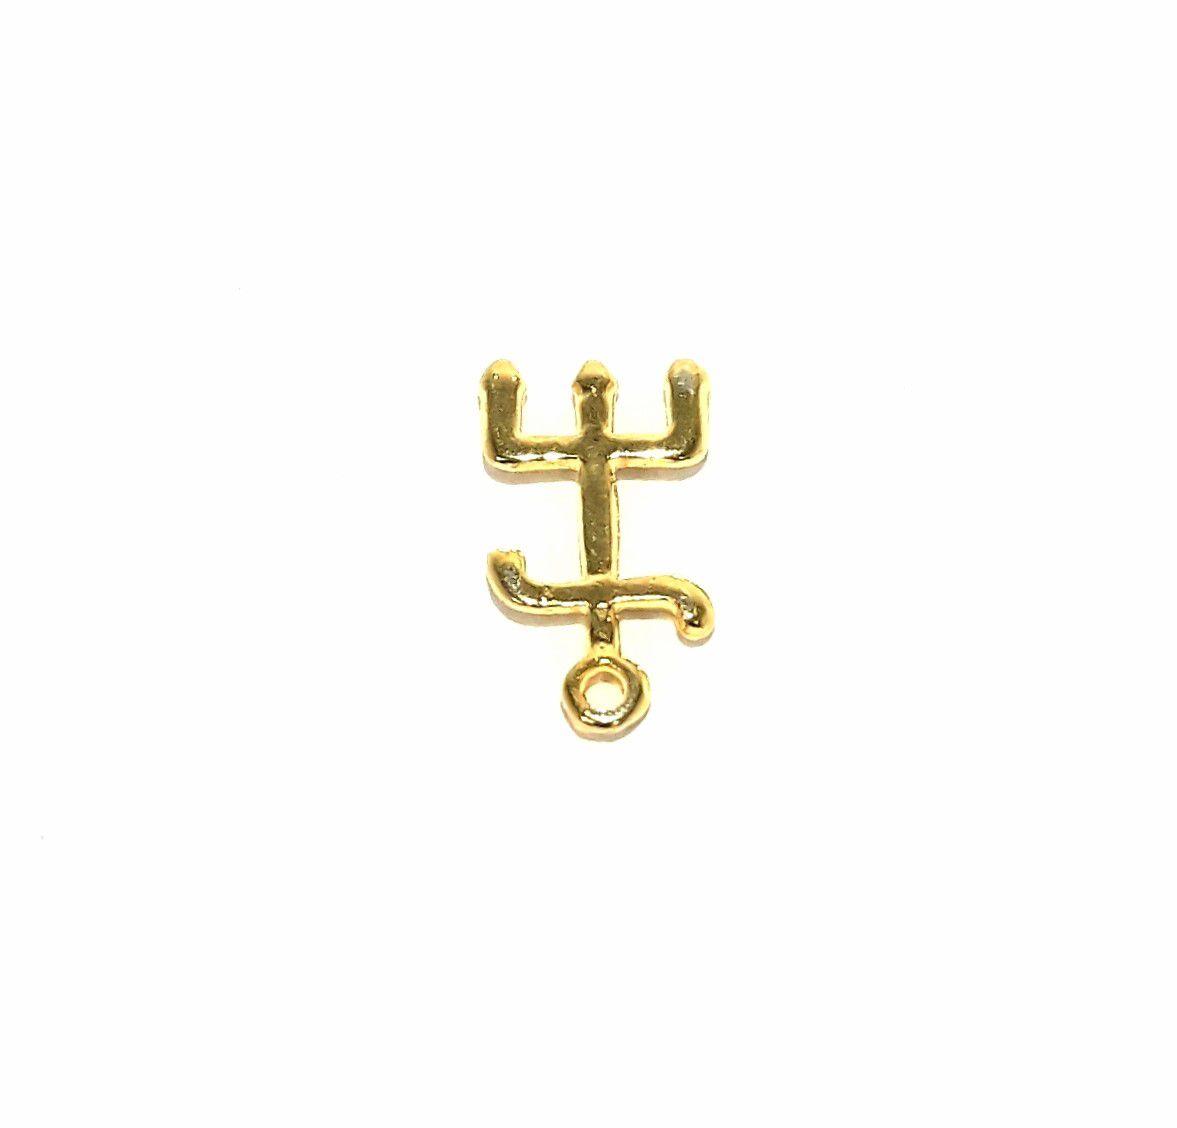 Tridente de Exu (Pequeno) - PING113